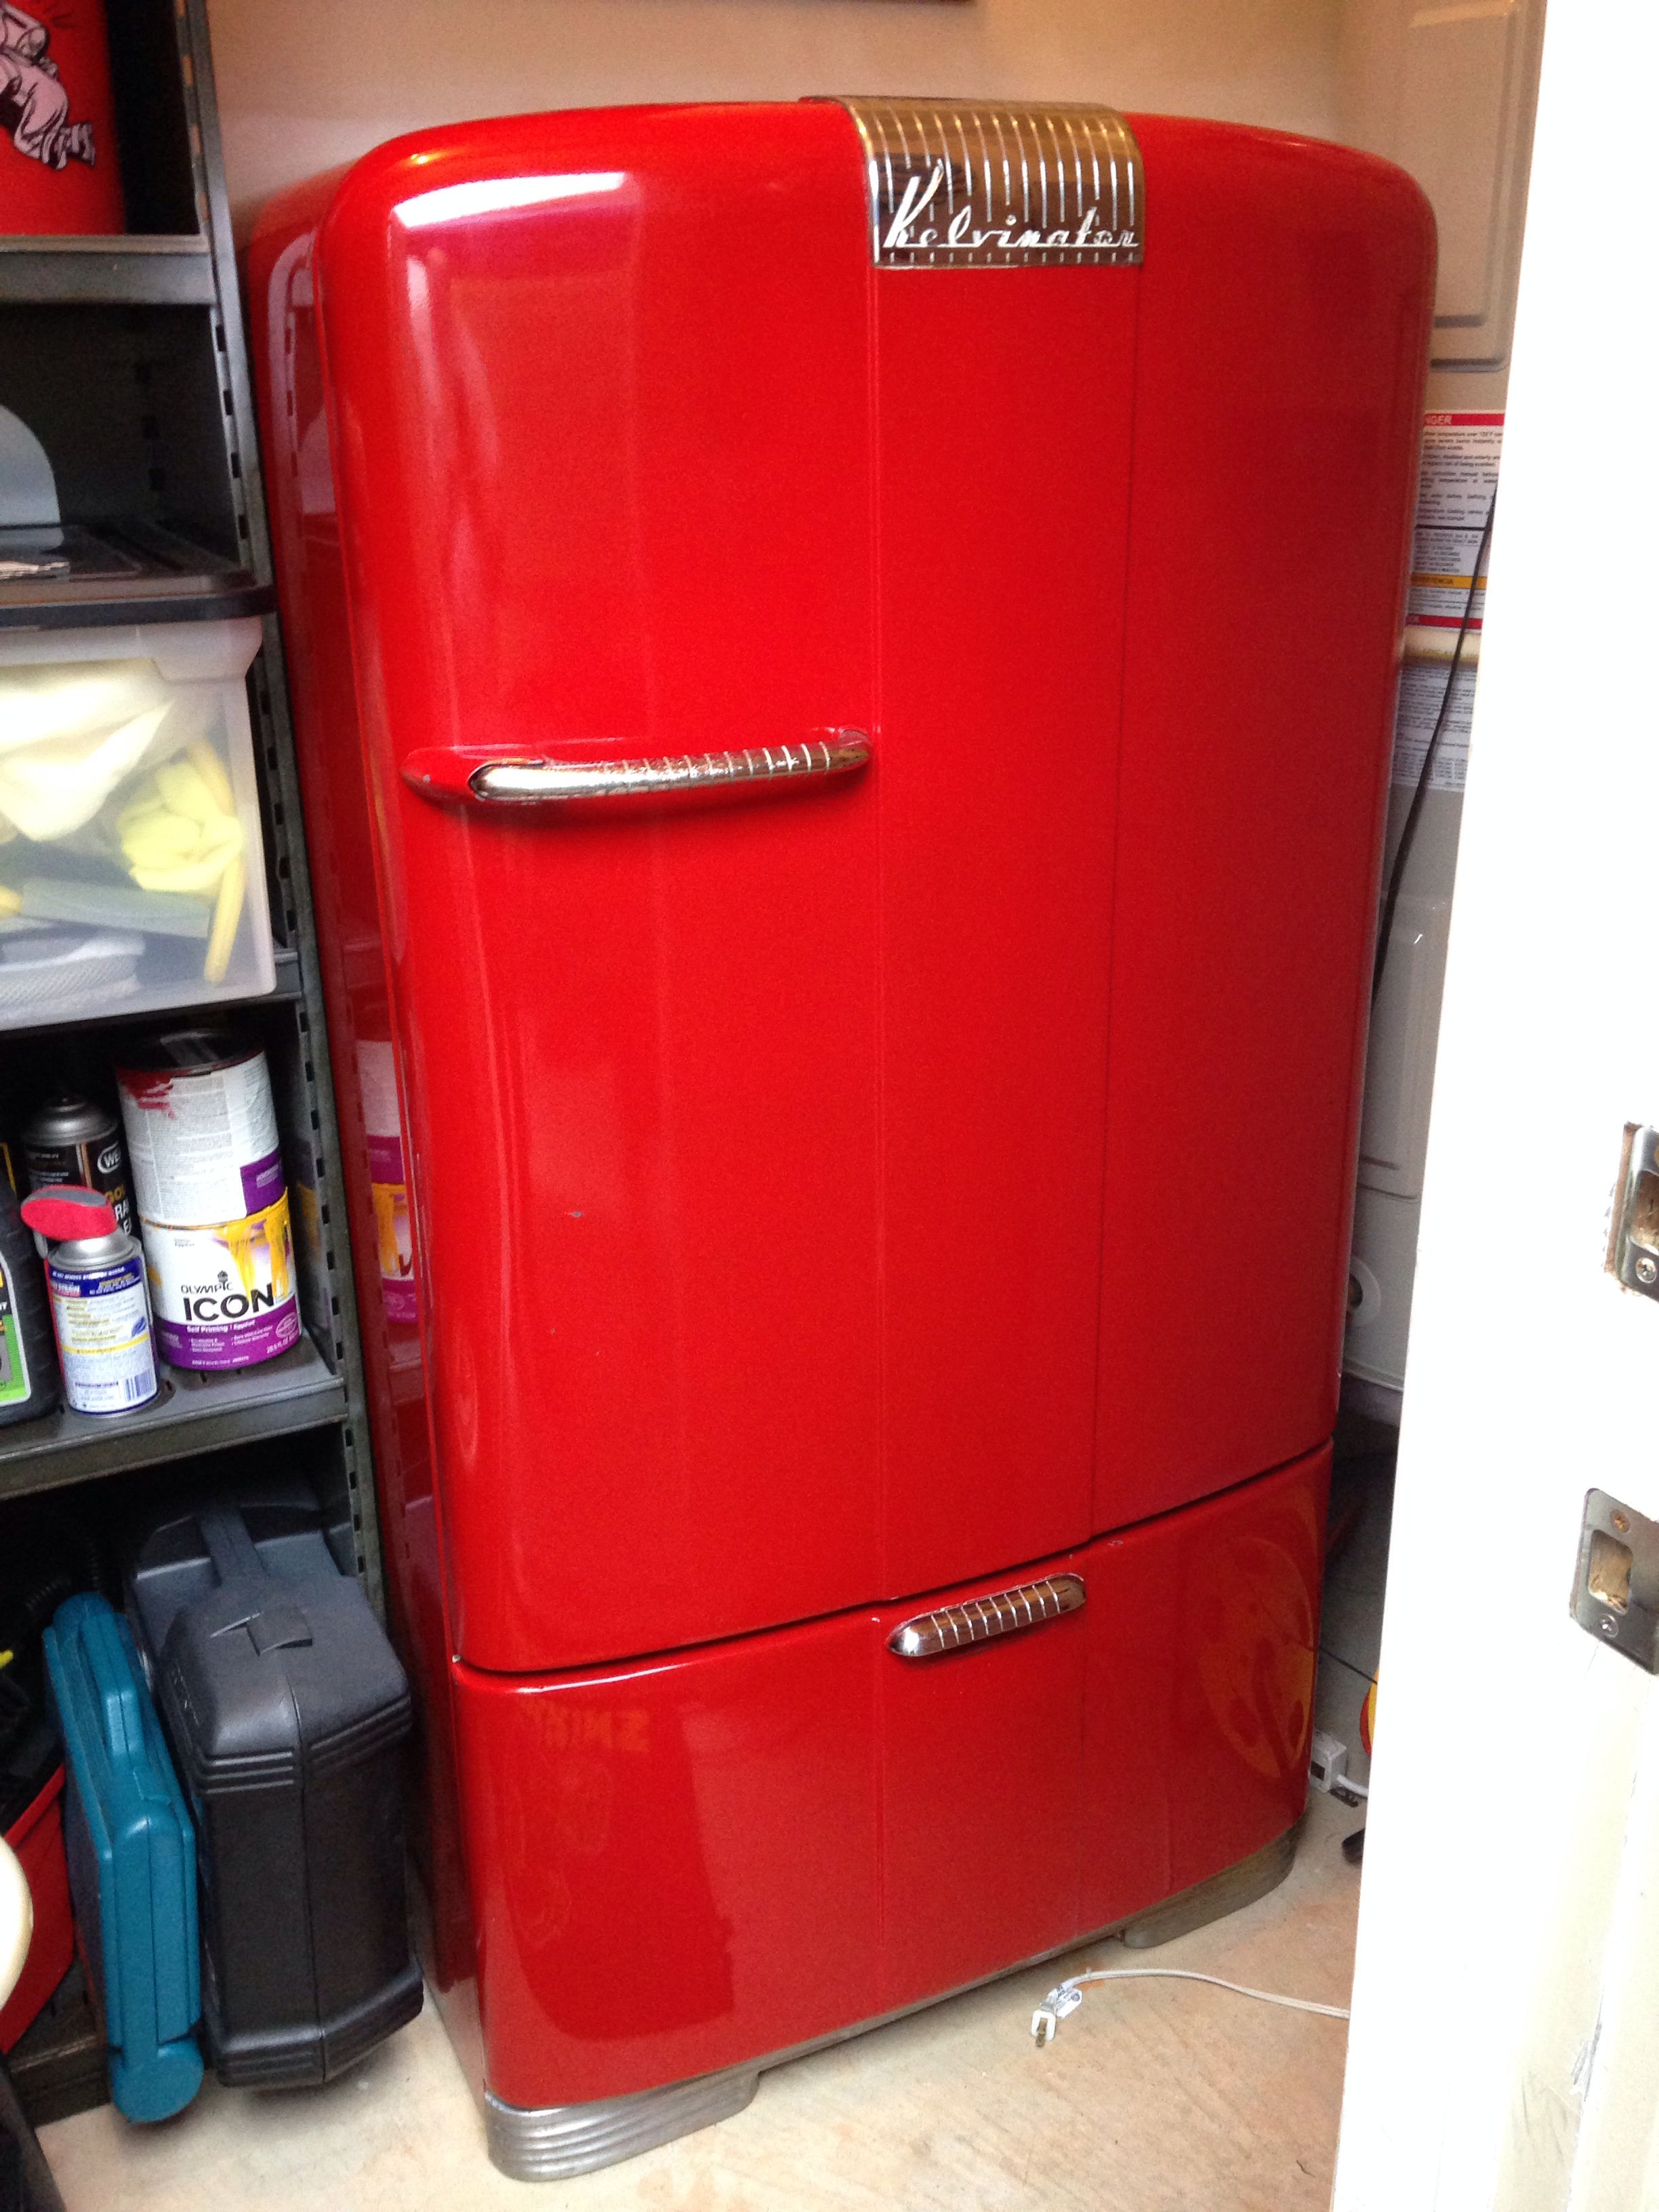 1946 Kelvinator Refrigerator Vintage Refrigerator Vintage Fridge Retro Refrigerator